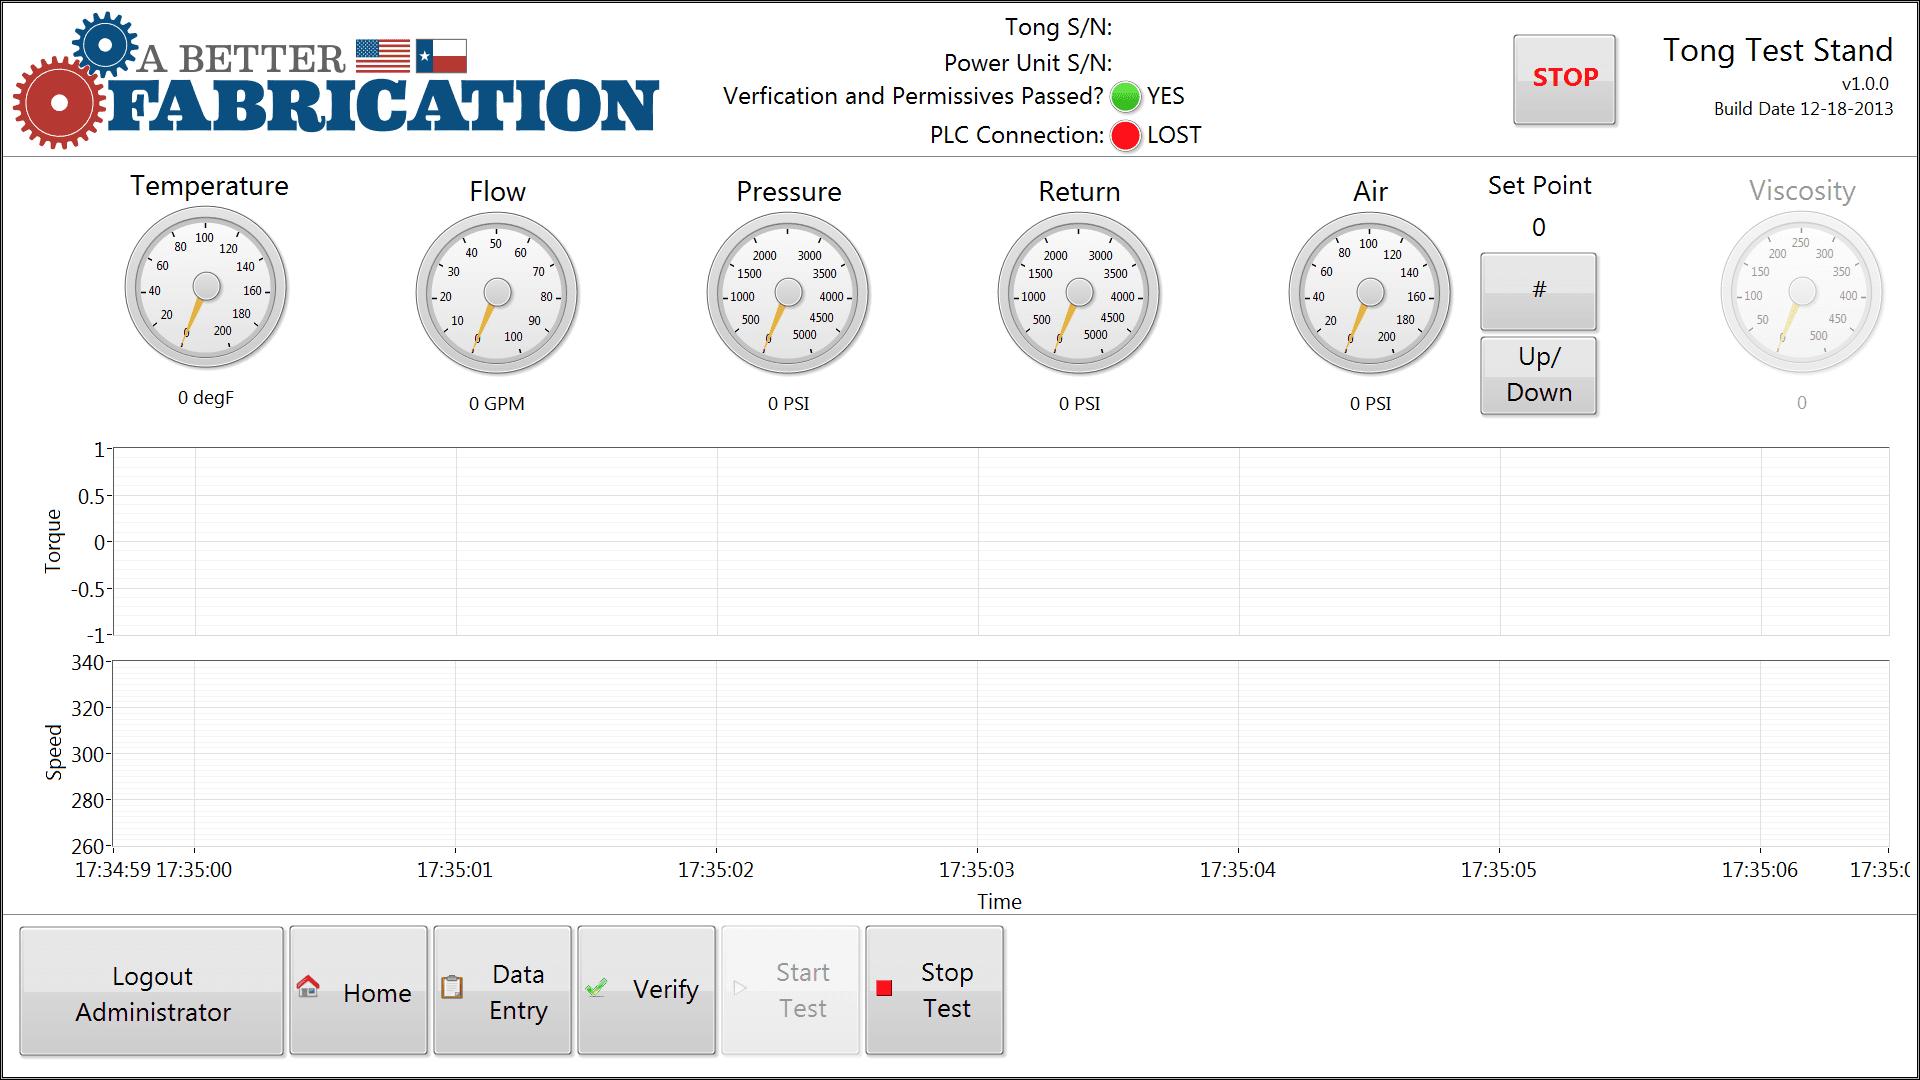 Start test screen shot on operations panel